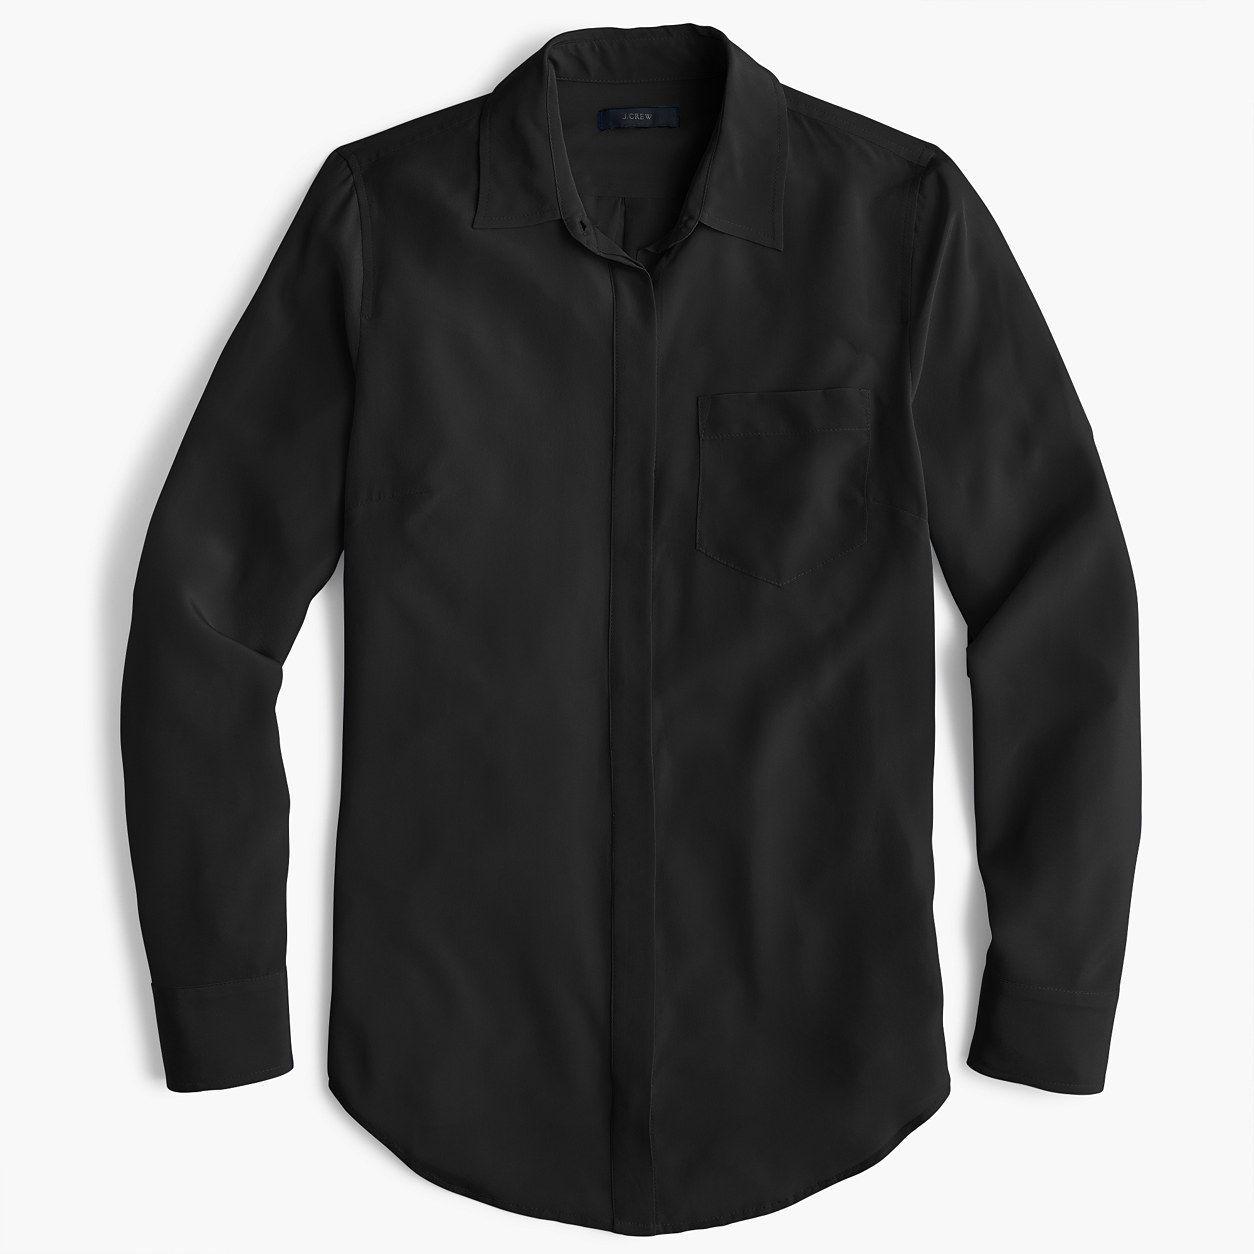 2e435c81 J.Crew Womens Petite Silk Button-Up Shirt (Size 12 Petite ...